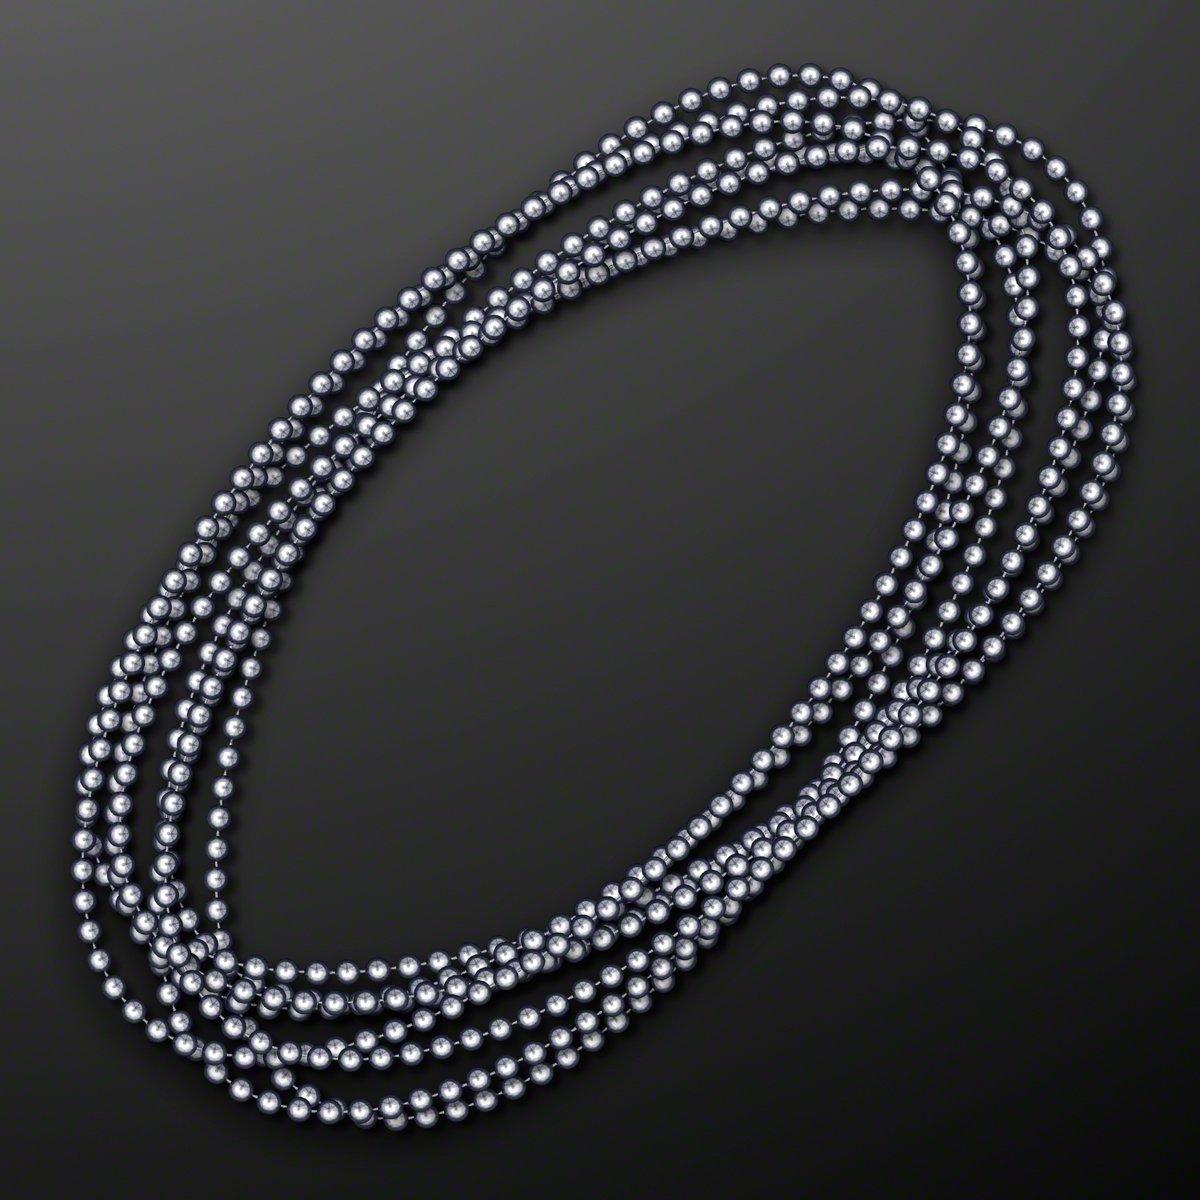 FlashingBlinkyLights Silver Round Ball Mardi Gras Bead Necklaces (Set of 144)